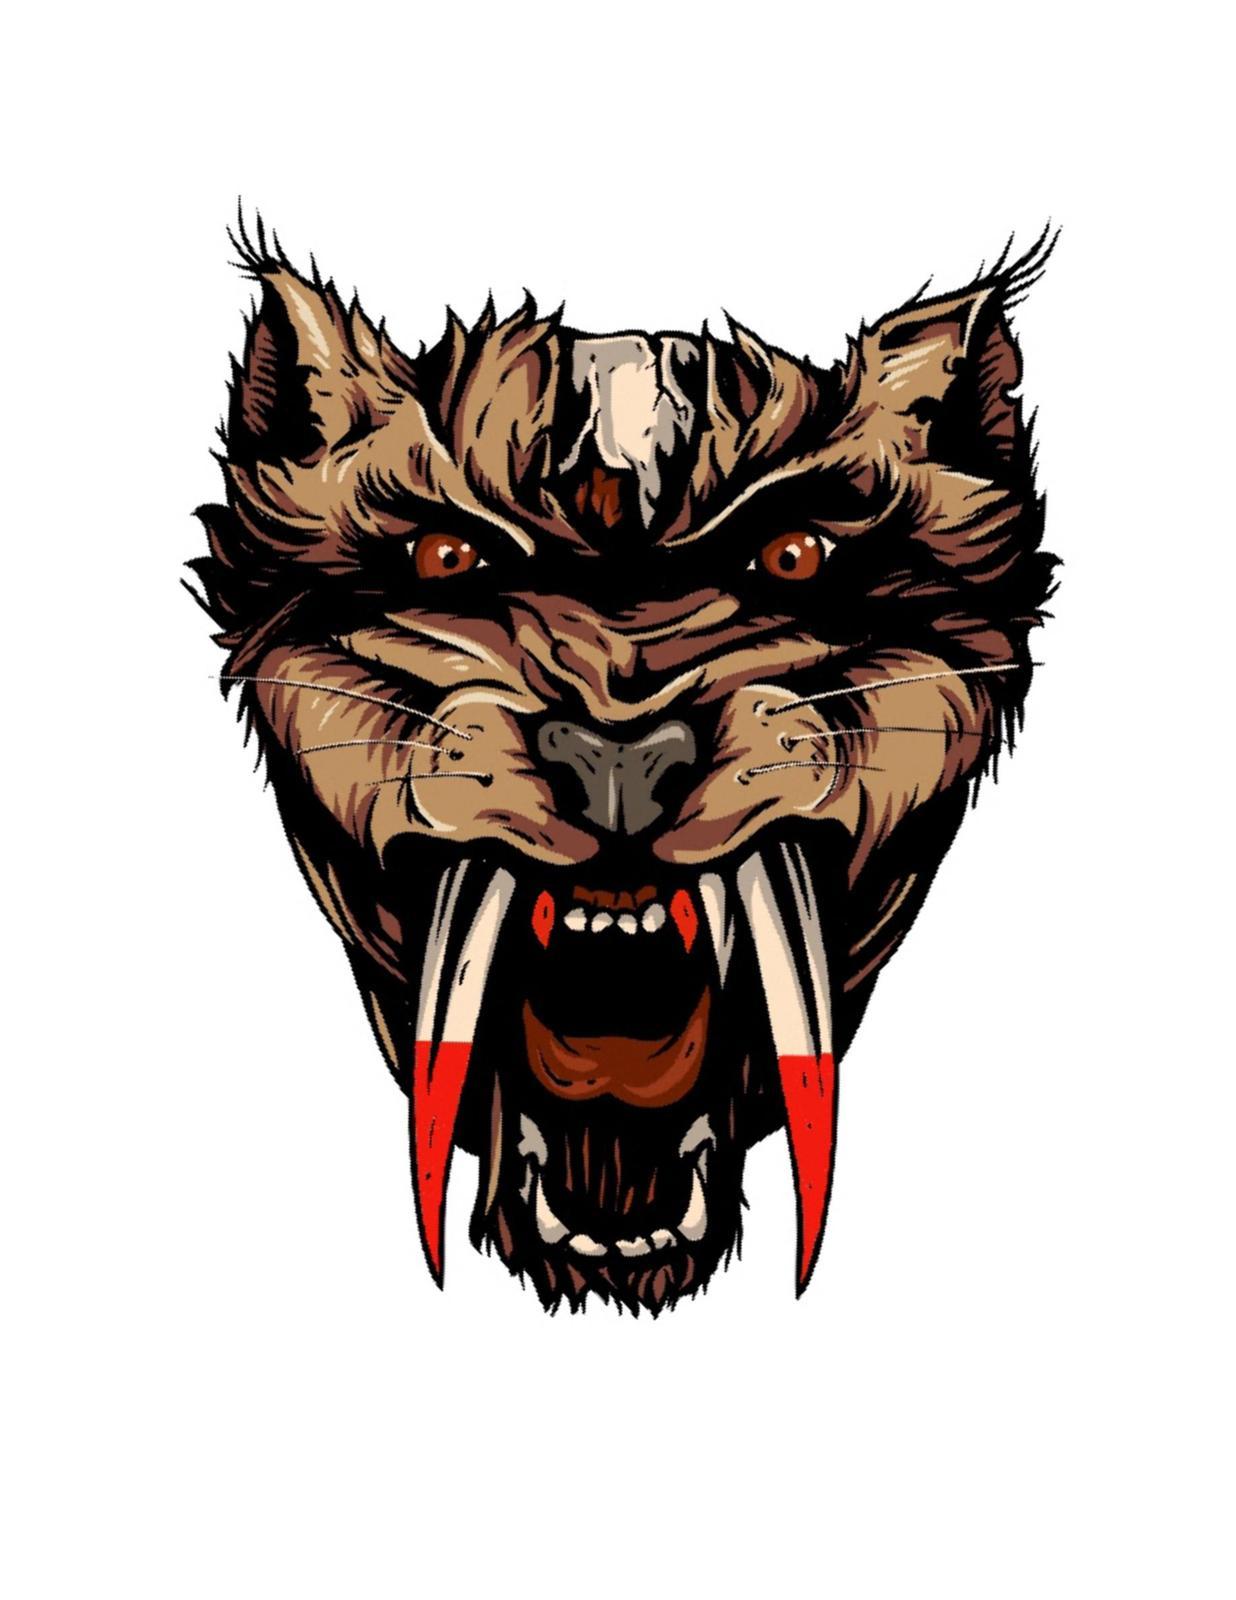 Wolf Mythical Creature1-ClipArt-Digital Art Clip-Digital. - $3.99